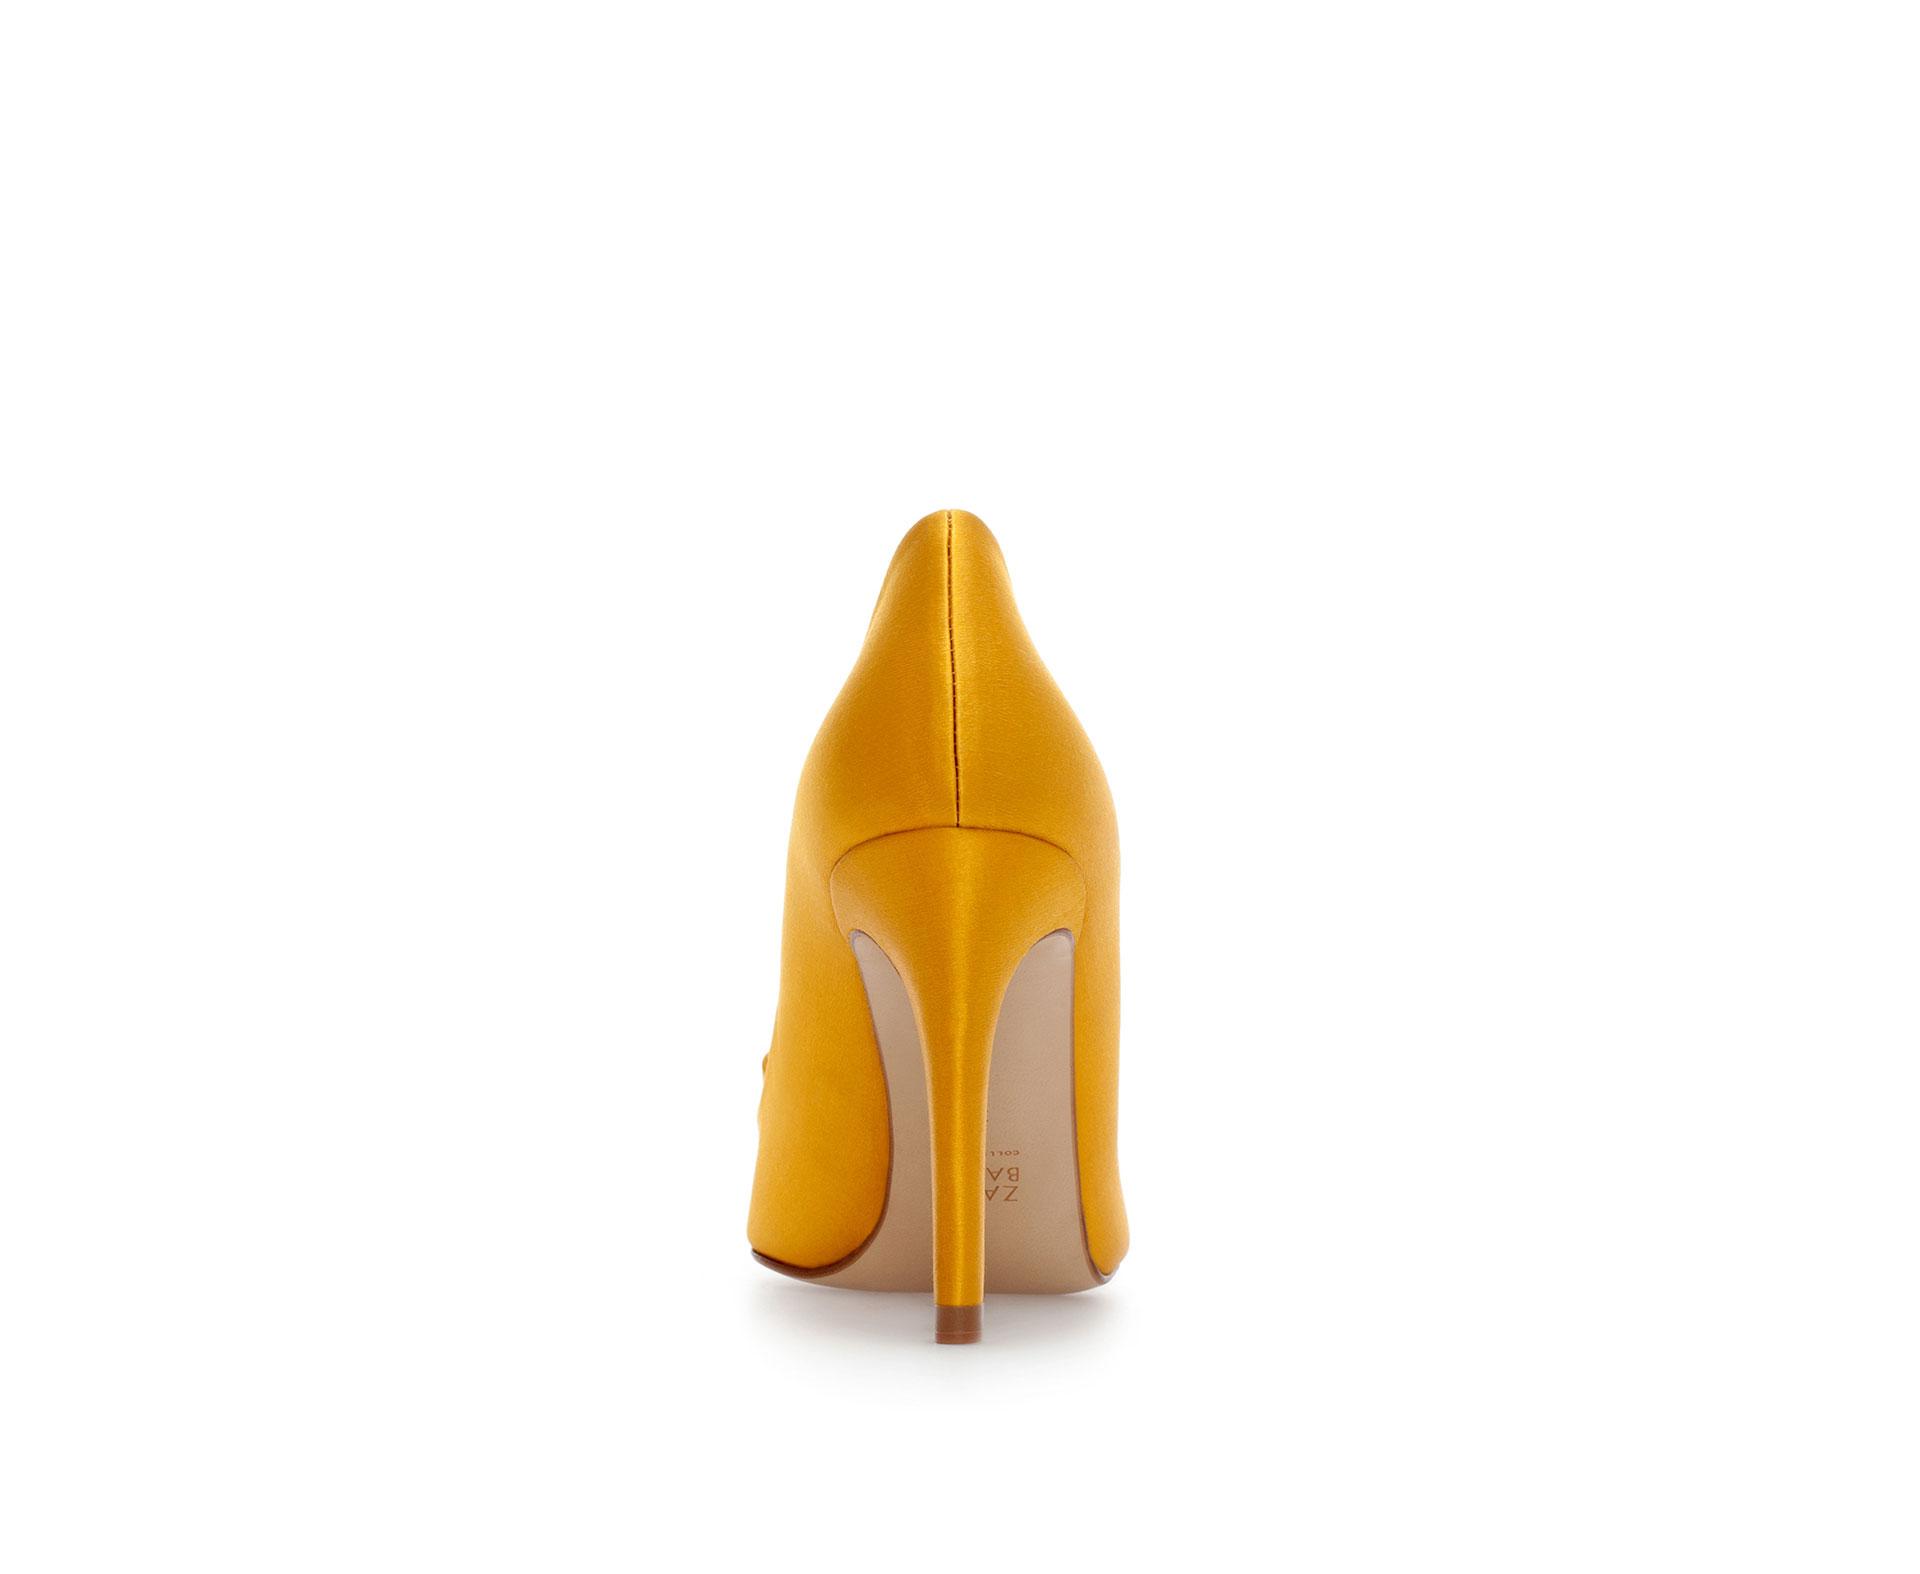 Zara Leather High Heel Shoes Mustard